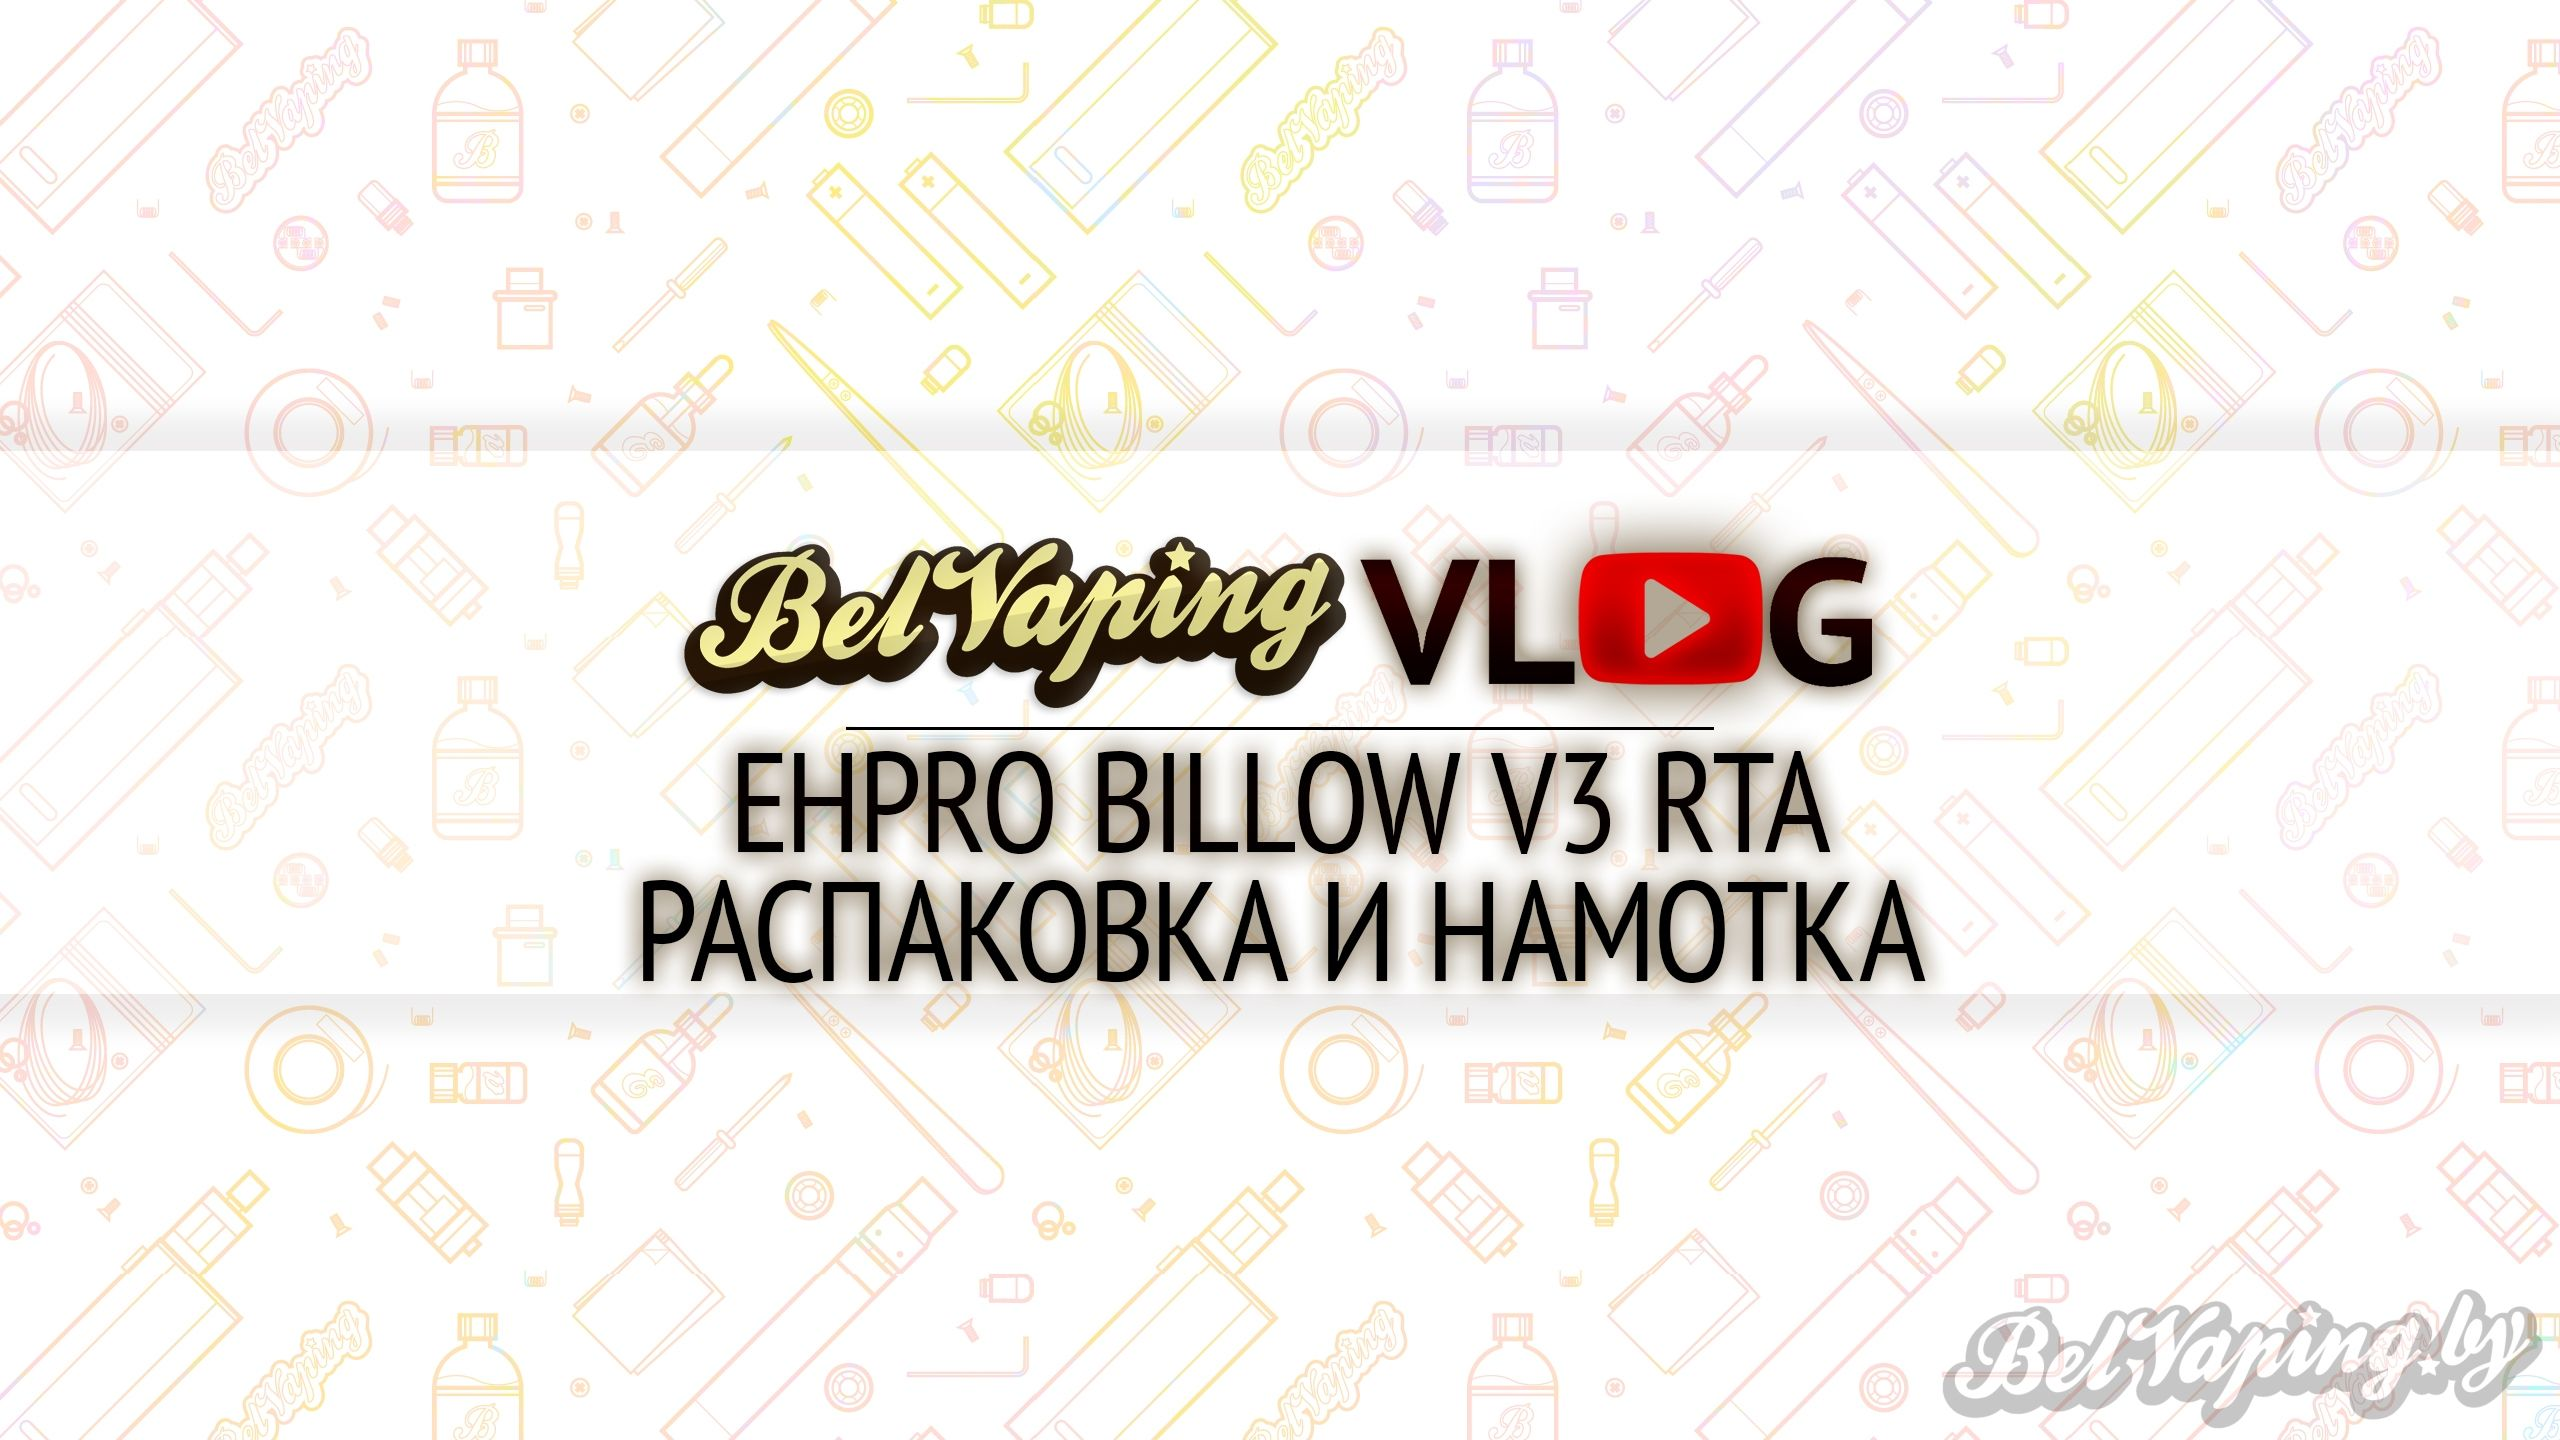 BelVapingVlog: Распаковка и намотка Billow V3 RTA